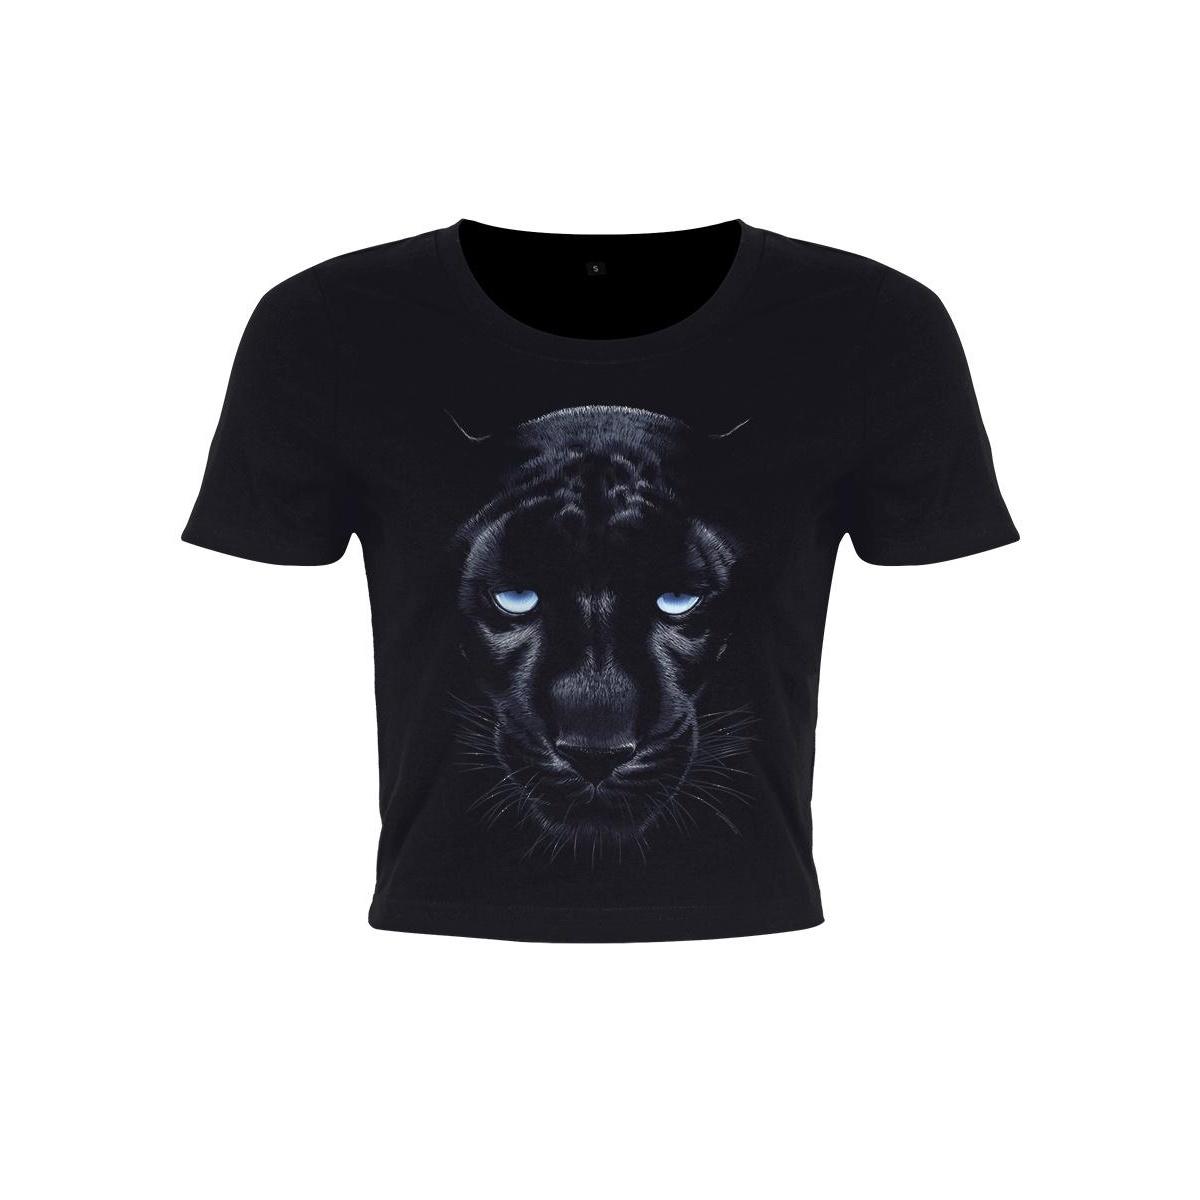 Unorthodox Collective Womens/Ladies Panther Crop Top (S) (Black)